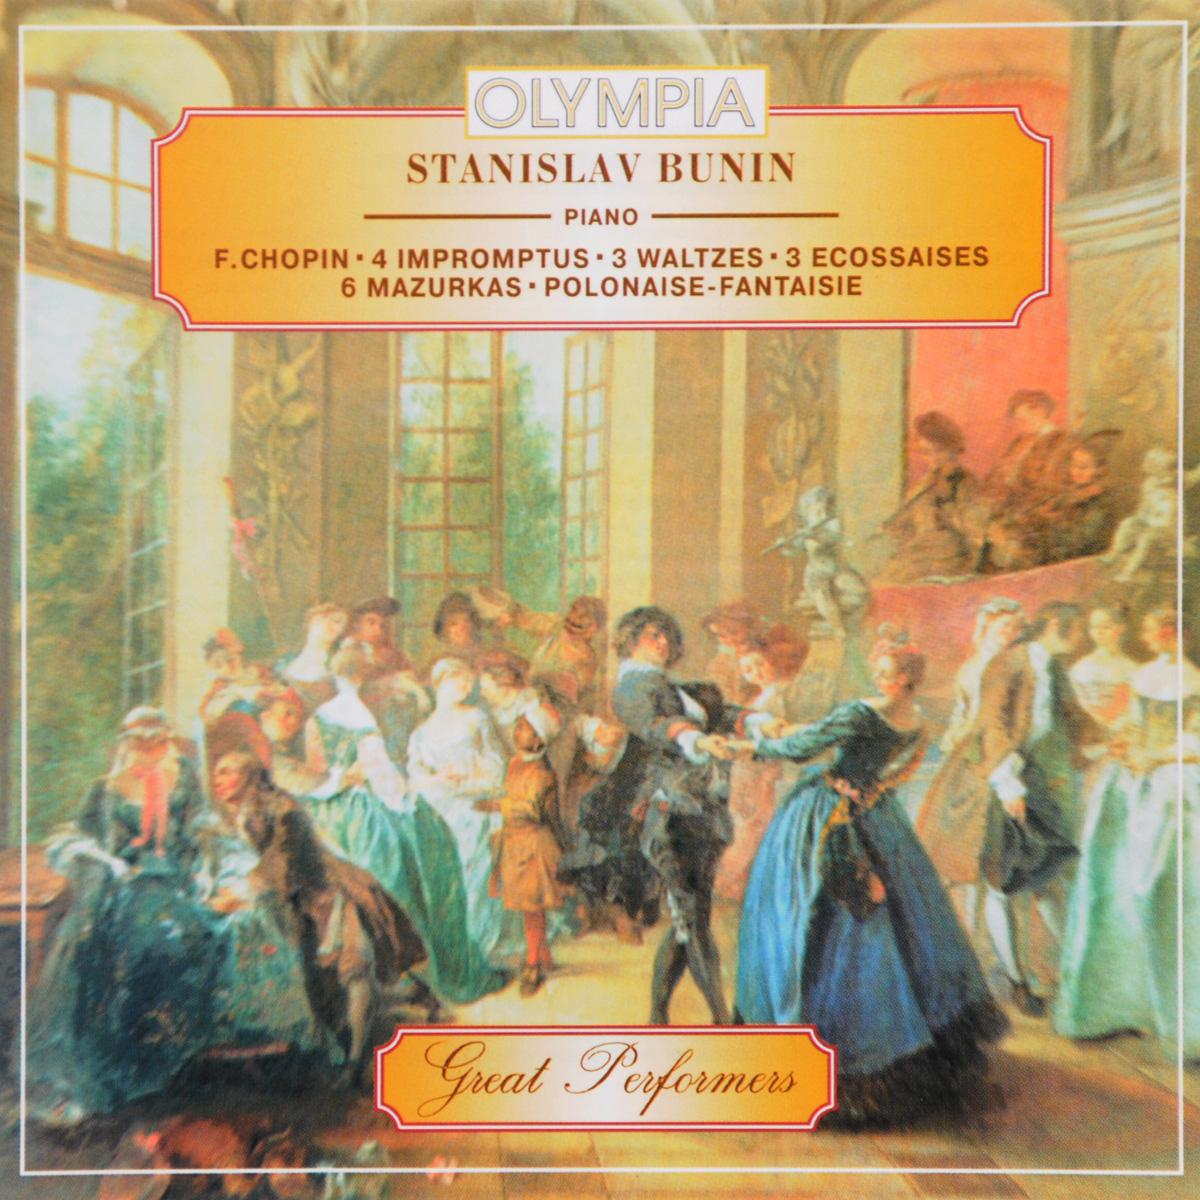 Stanislav Bunin. F. Chopin. 4 Impromptus / 3 Waltzes / 3 Ecossaises / 6 Mazurkas / Polonaise-Fantaisie